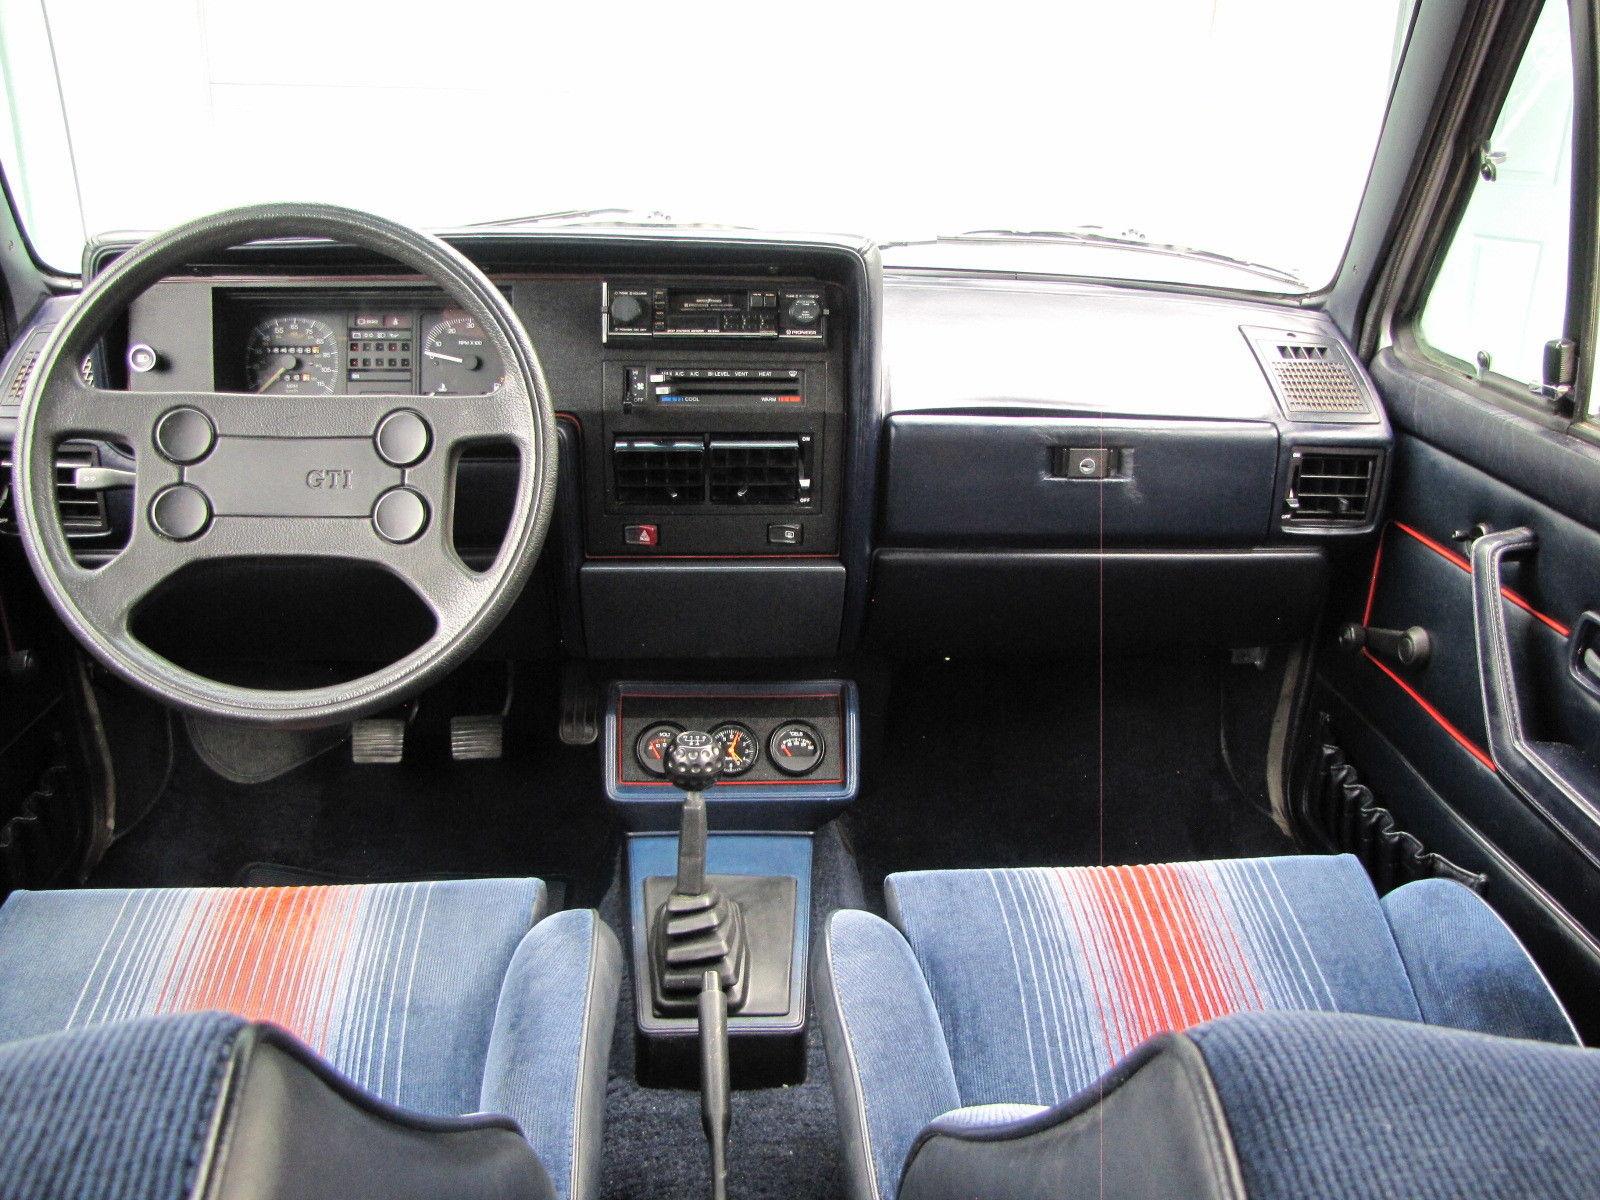 GTI fotd 600x450